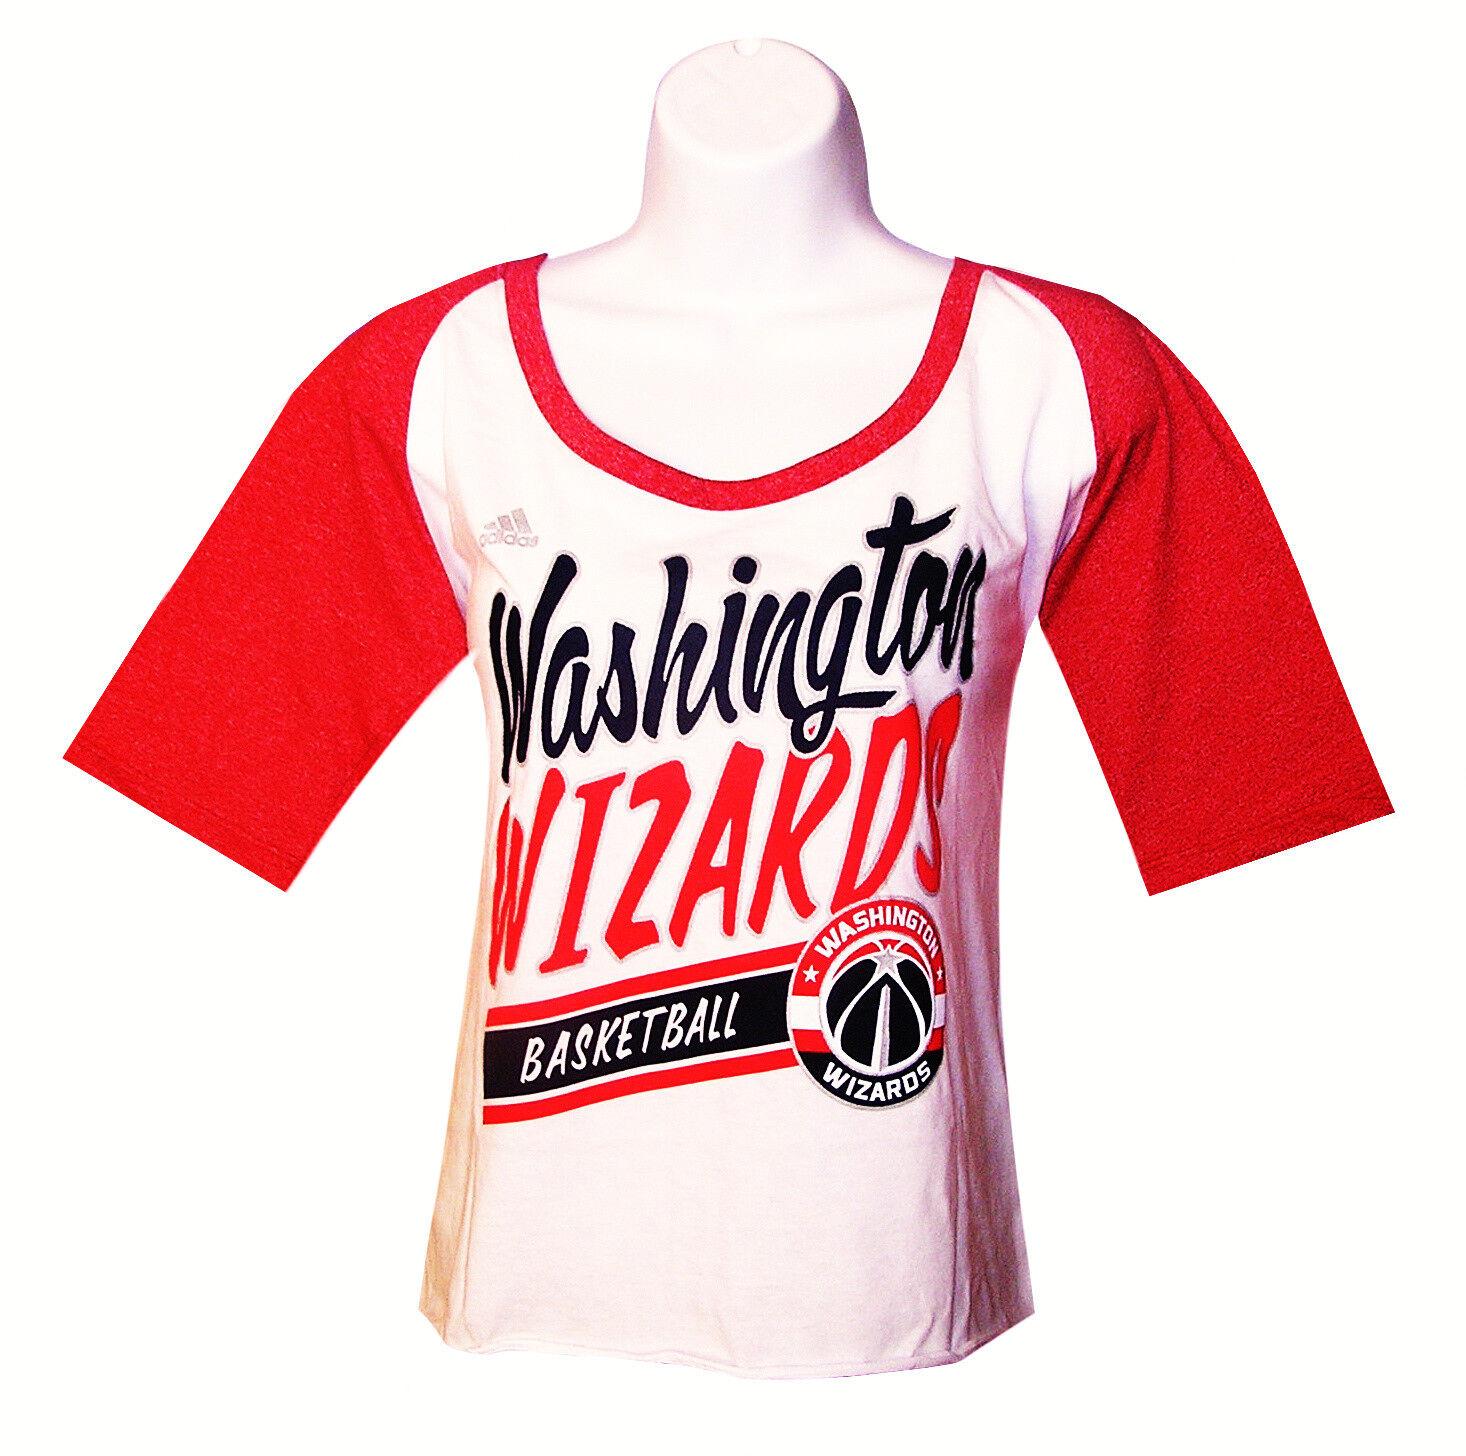 Nba Womens Apparel - Washington Wizards Adidas NBA Team Tee